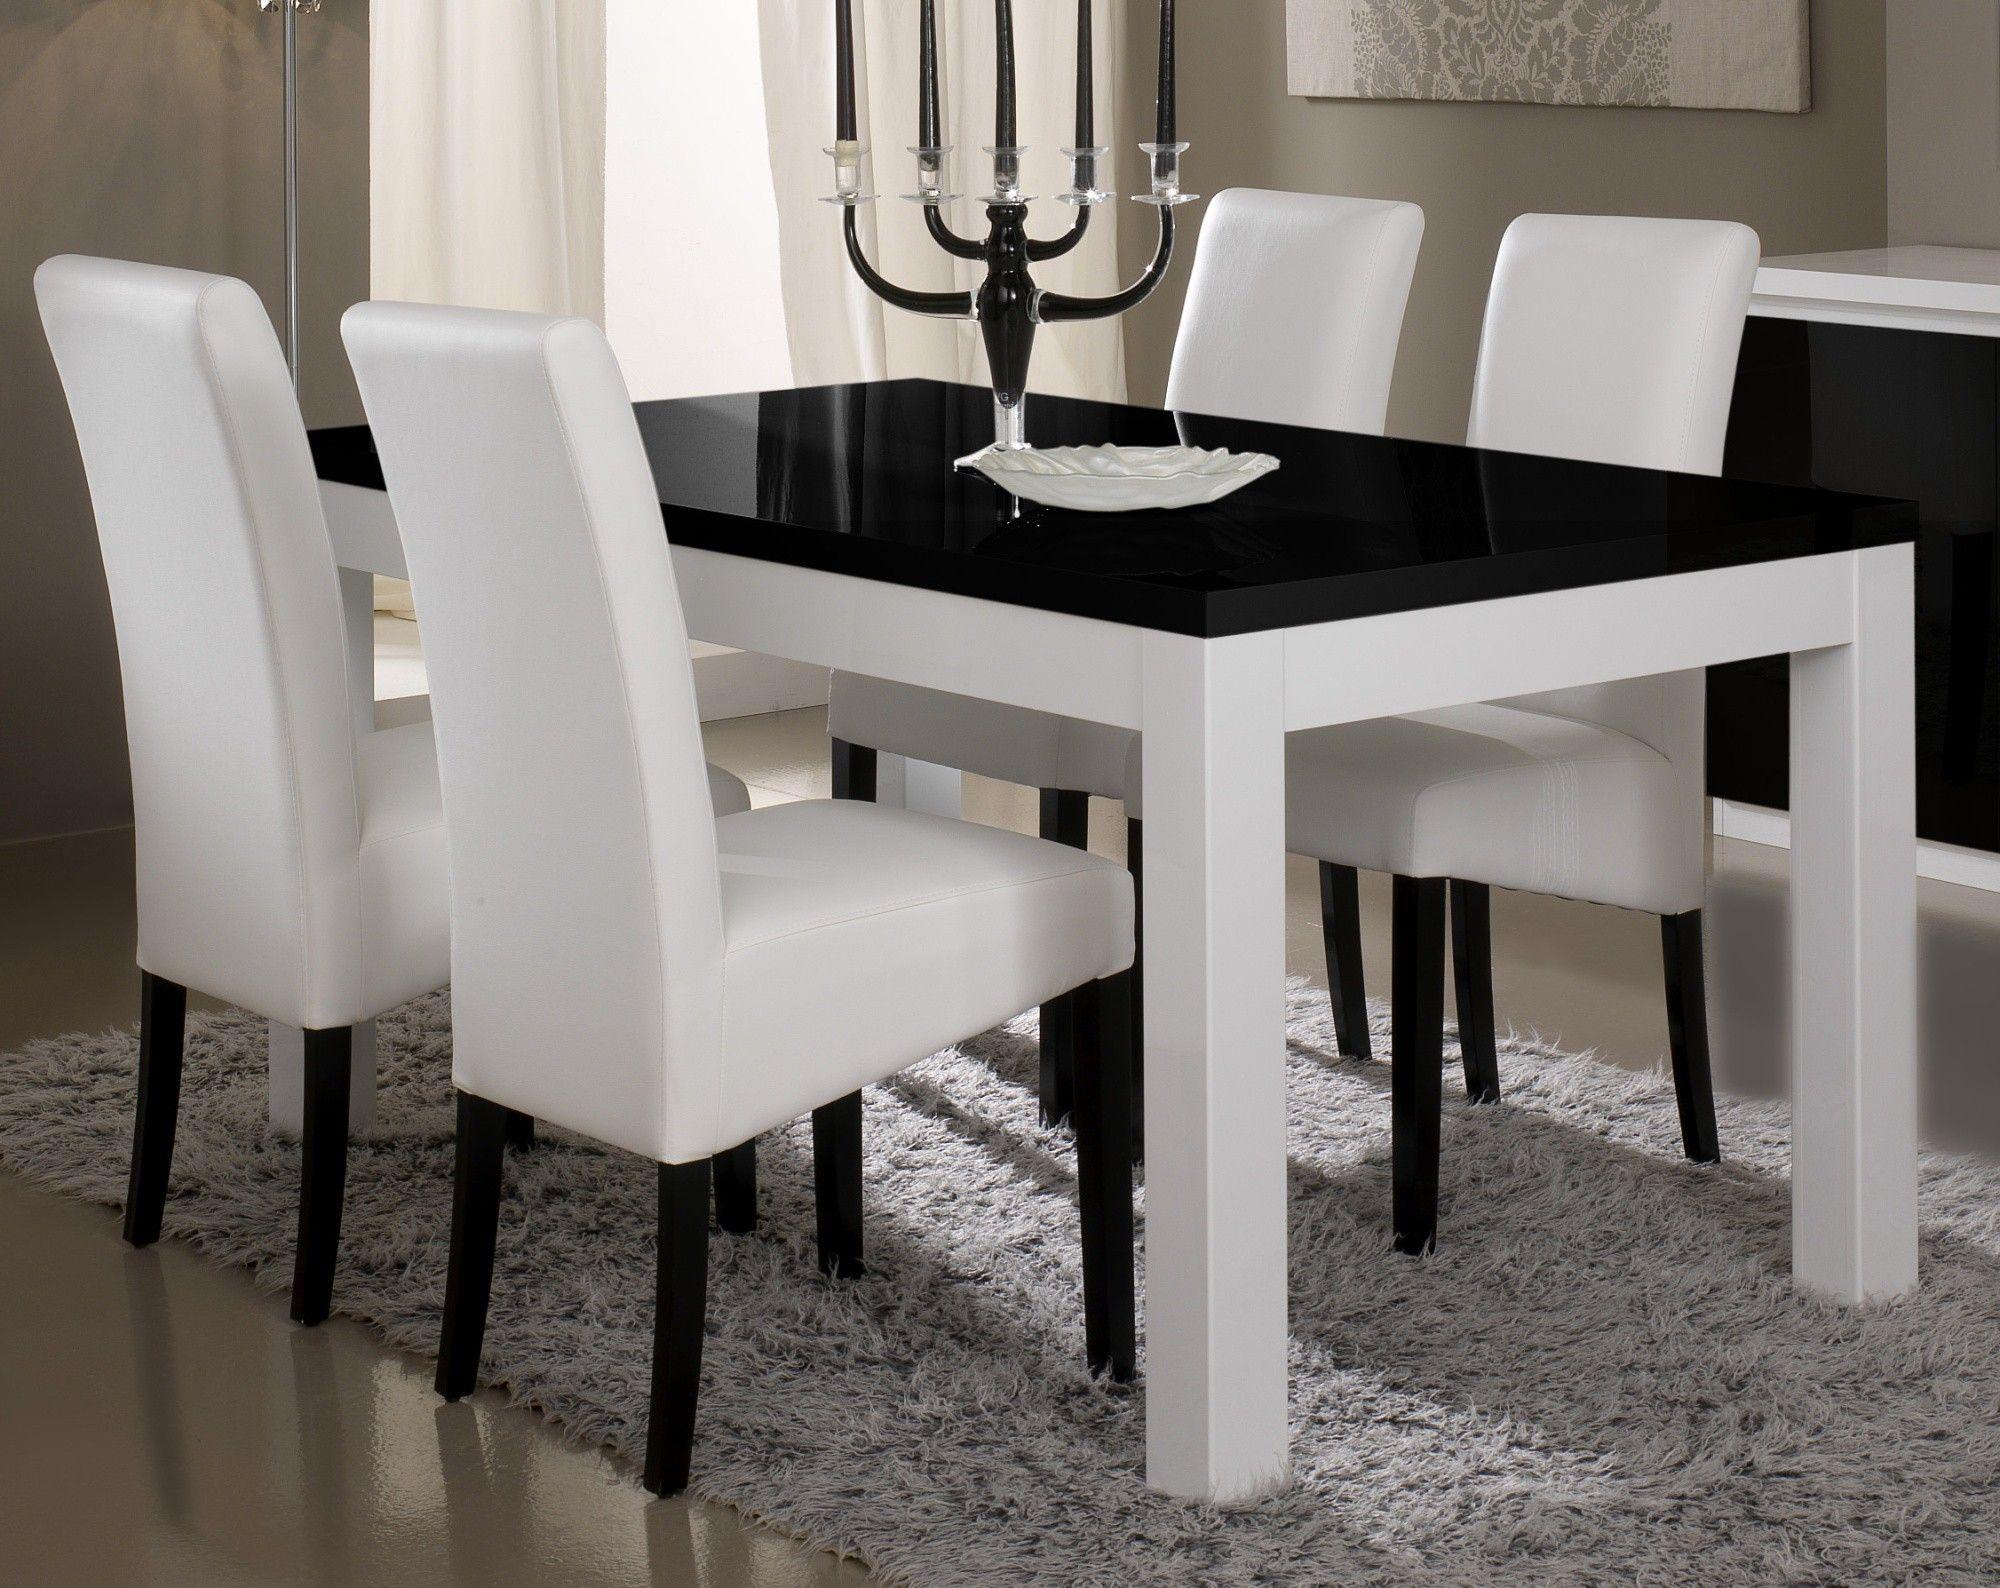 chaise pour table a manger